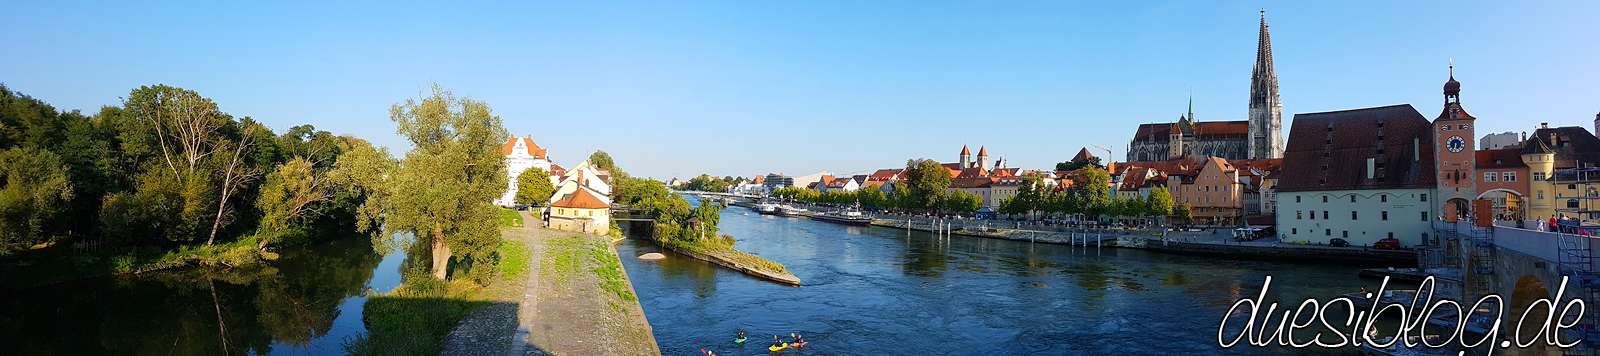 Regensburg Steinerne Brücke Donauufer Travelblog duesiblog 27